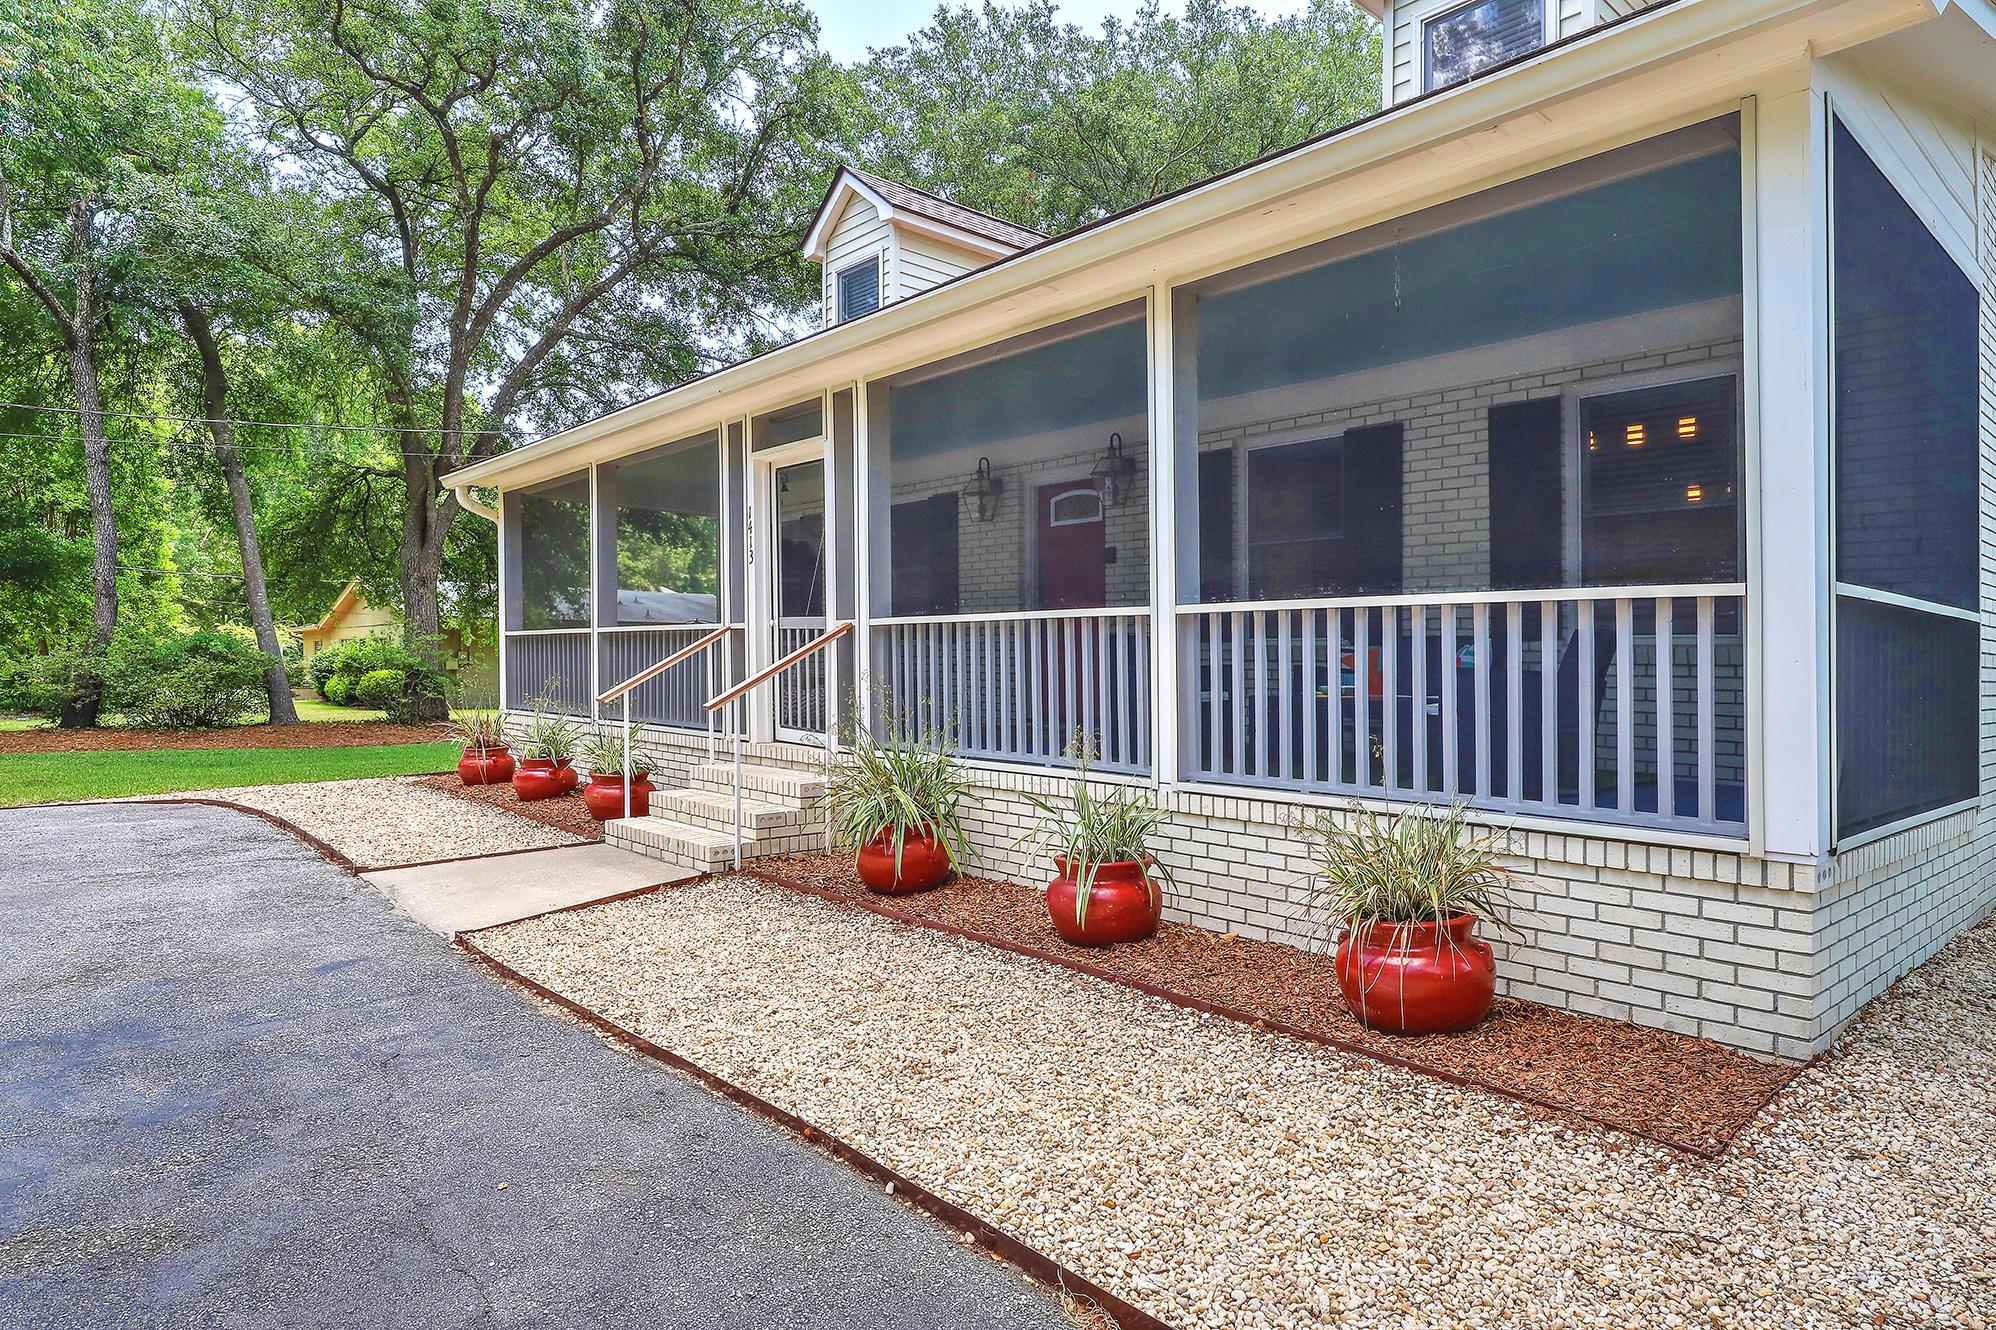 Edgewater Park Homes For Sale - 1413 Edsent, Charleston, SC - 5